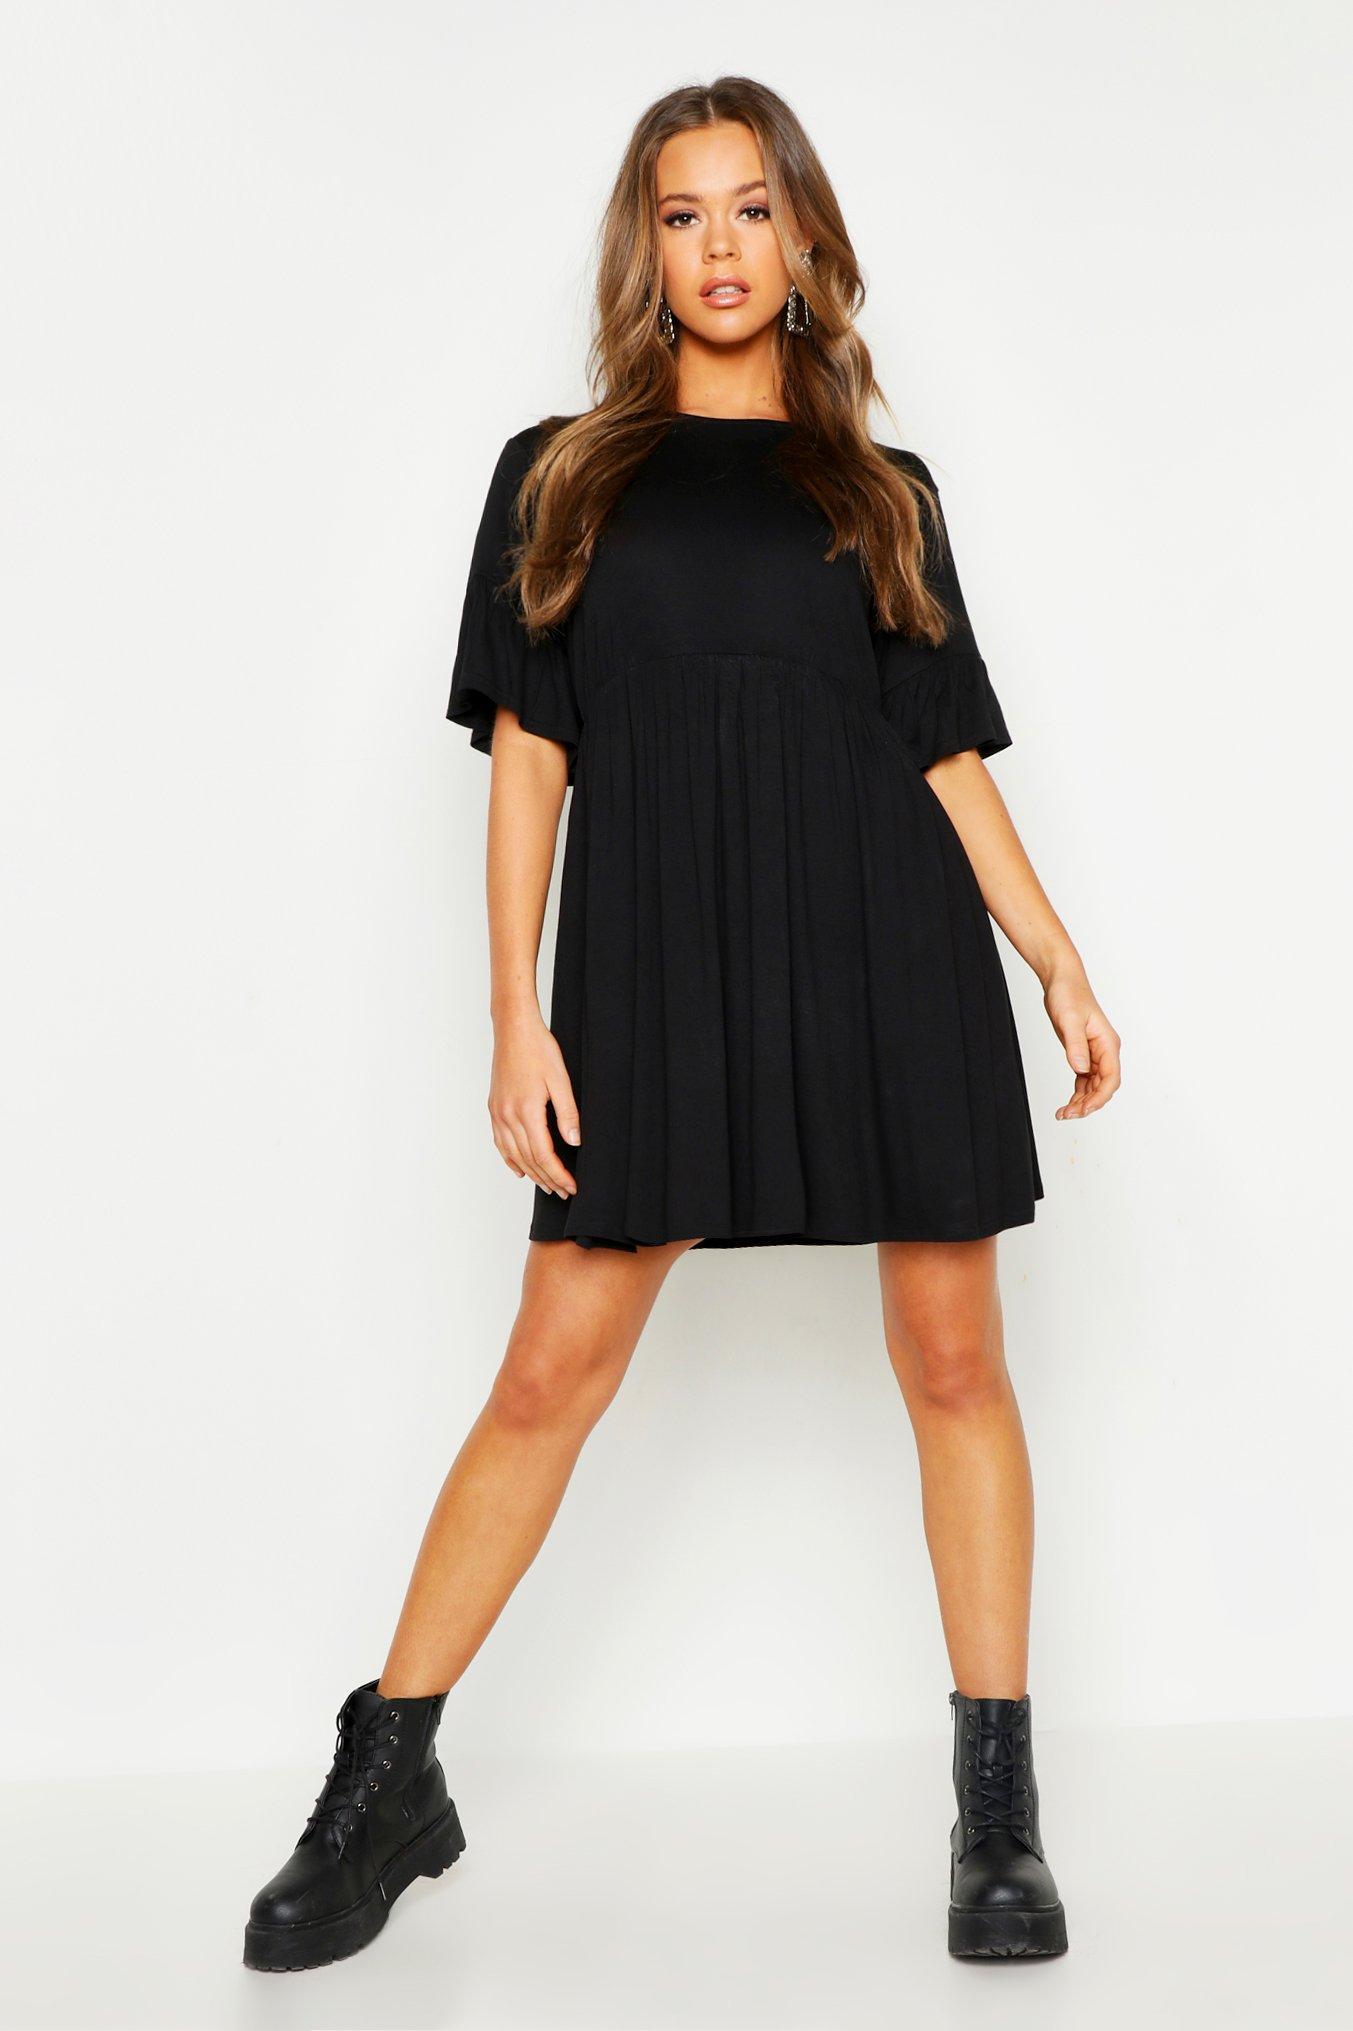 3b475ec37b Lyst - Boohoo Frill Sleeve Smock Dress